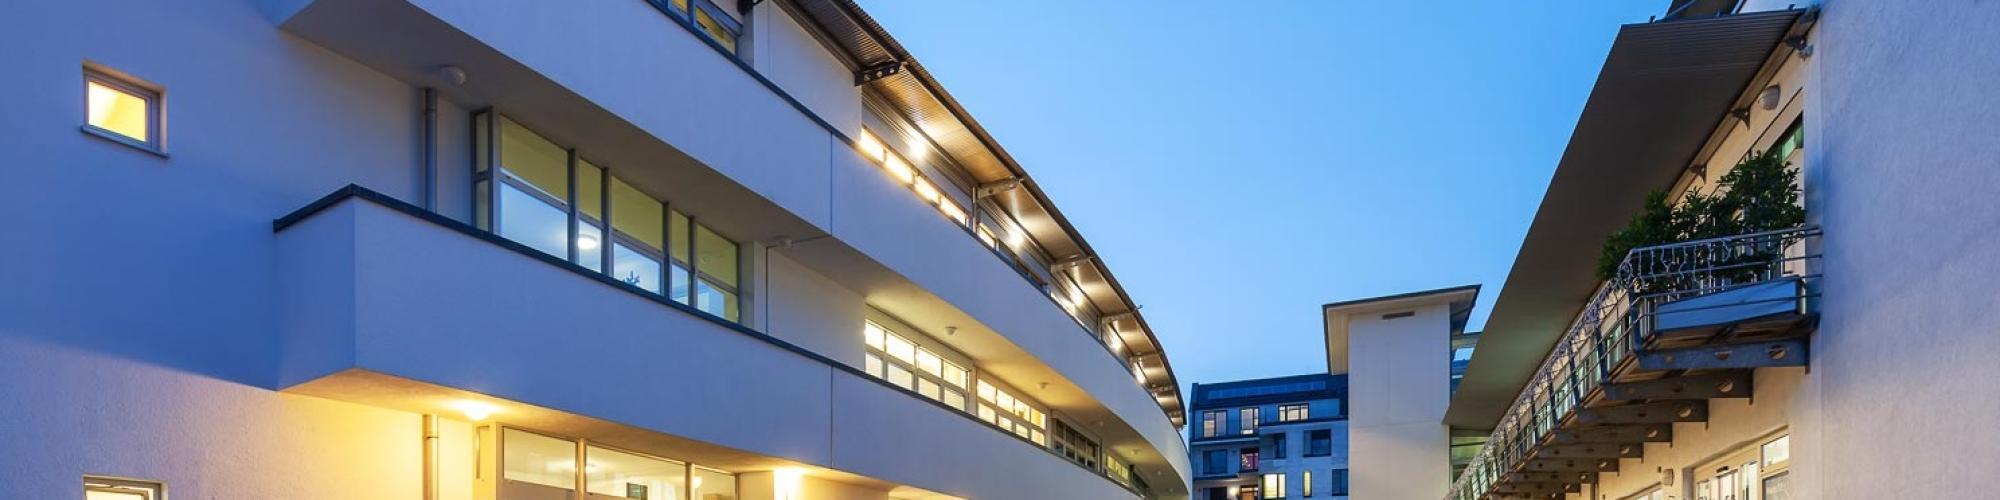 Ambulantes Zentrum für Rehabilitation und Prävention am Entenfang GmbH